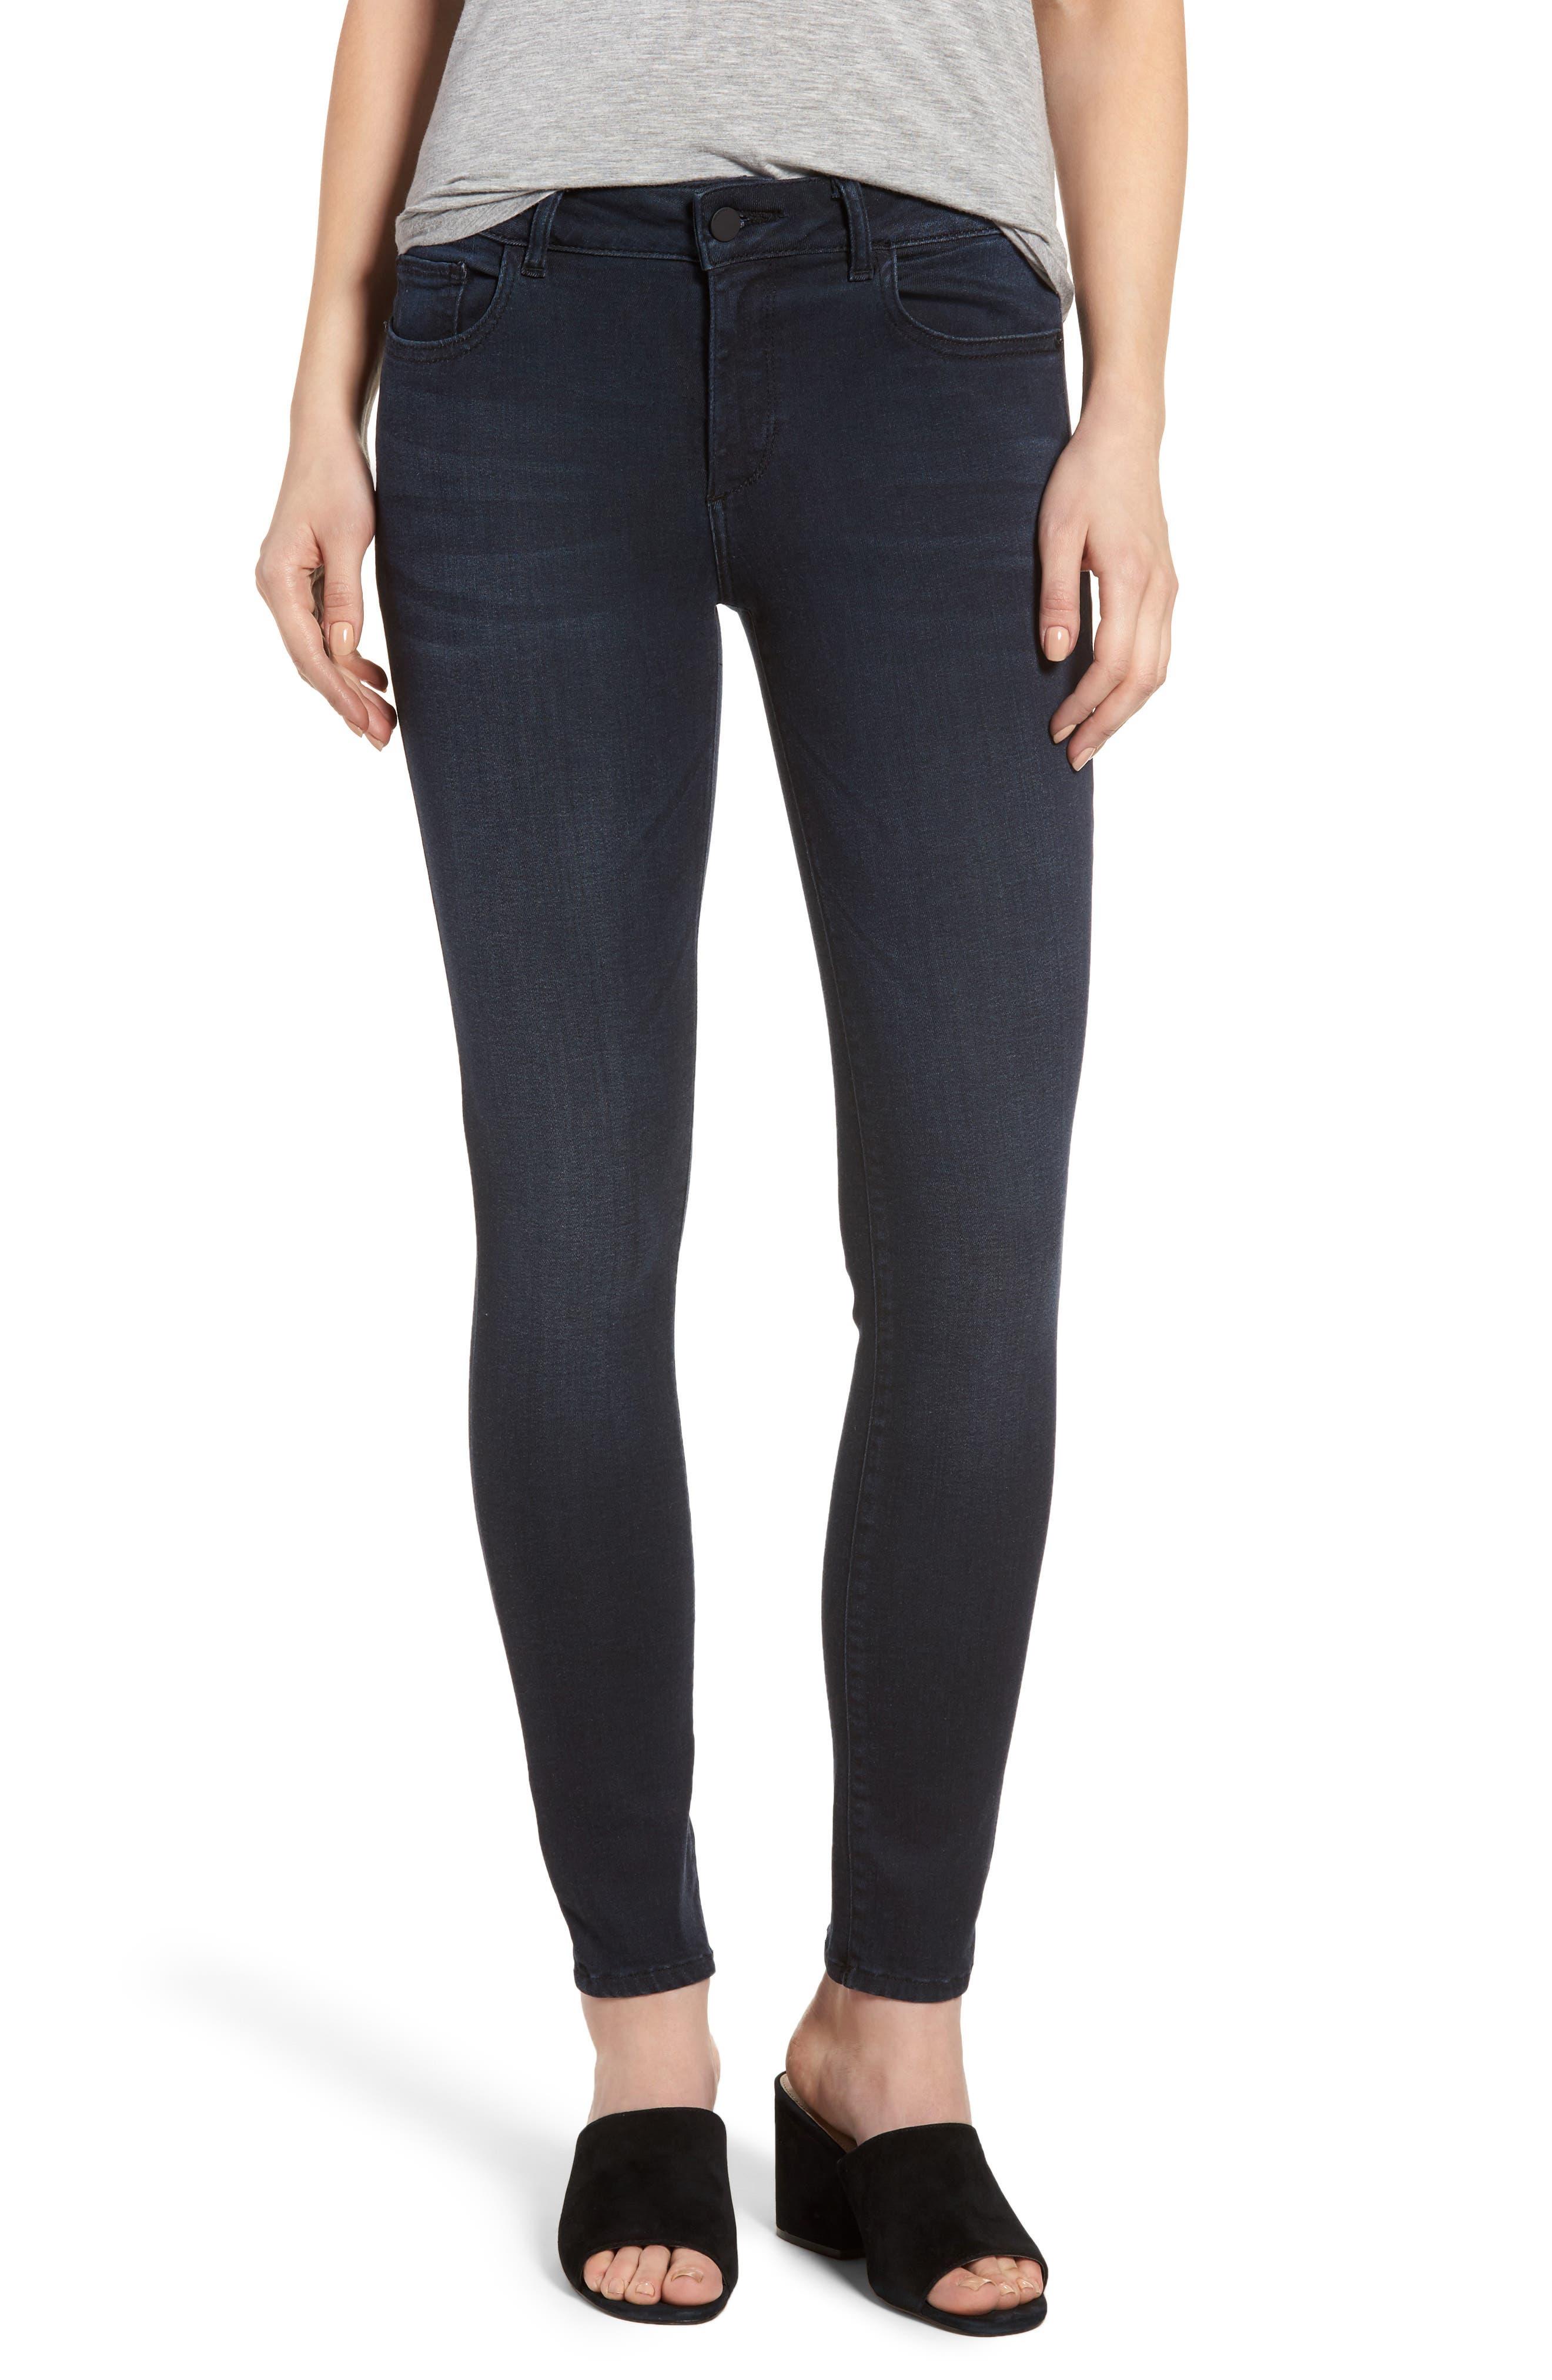 Emma Power Legging Skinny Jeans,                             Main thumbnail 1, color,                             Macon